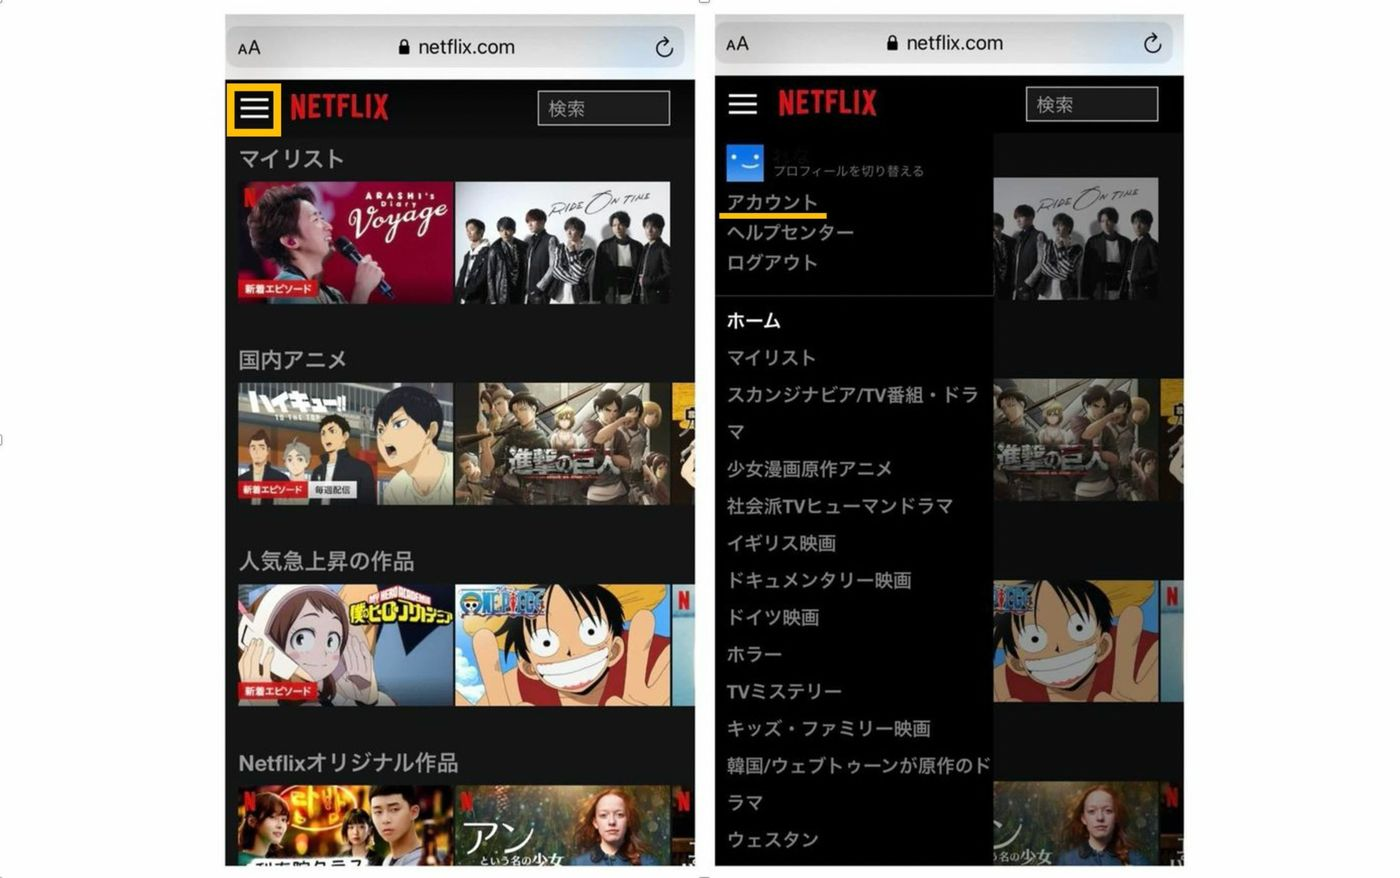 Netflixの解約・退会方法を分かりやすく解説!iPhoneやauでの手順もの画像